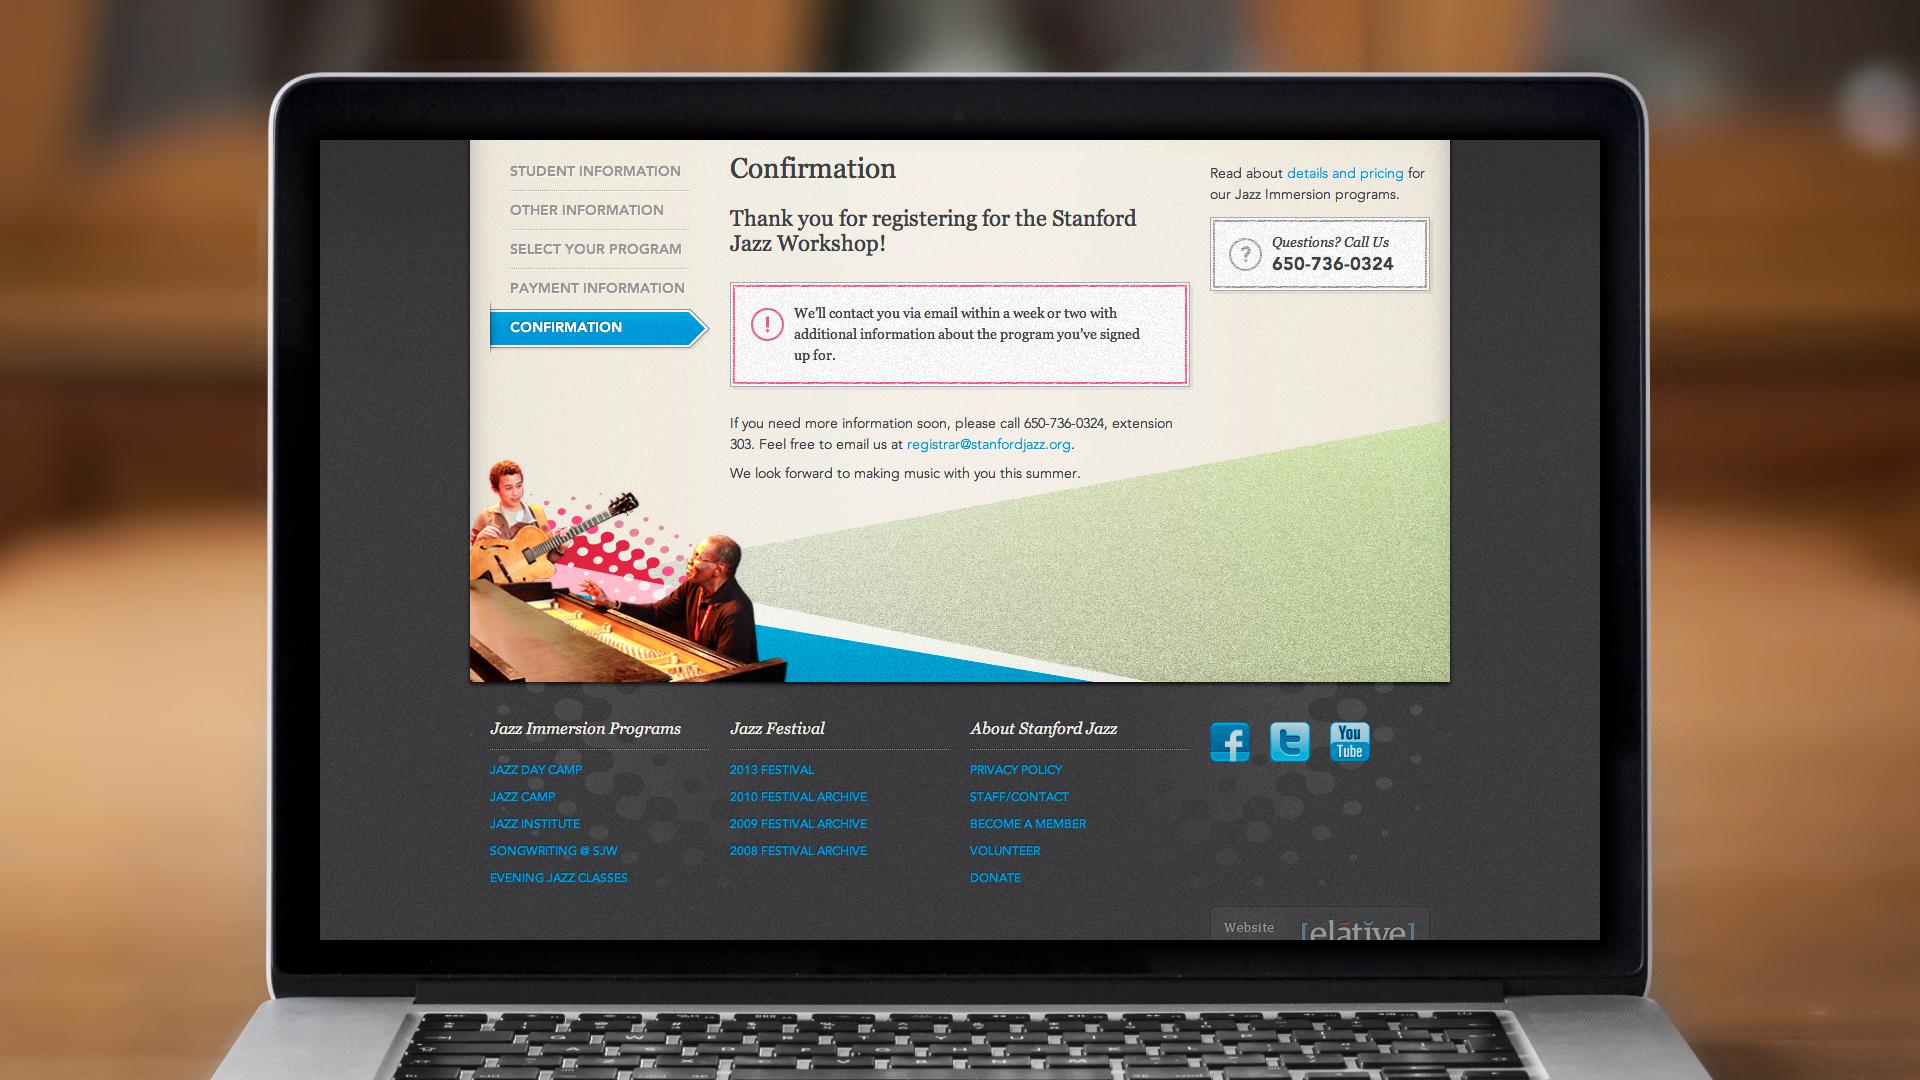 Web – Registration – Step 5, Confirmation